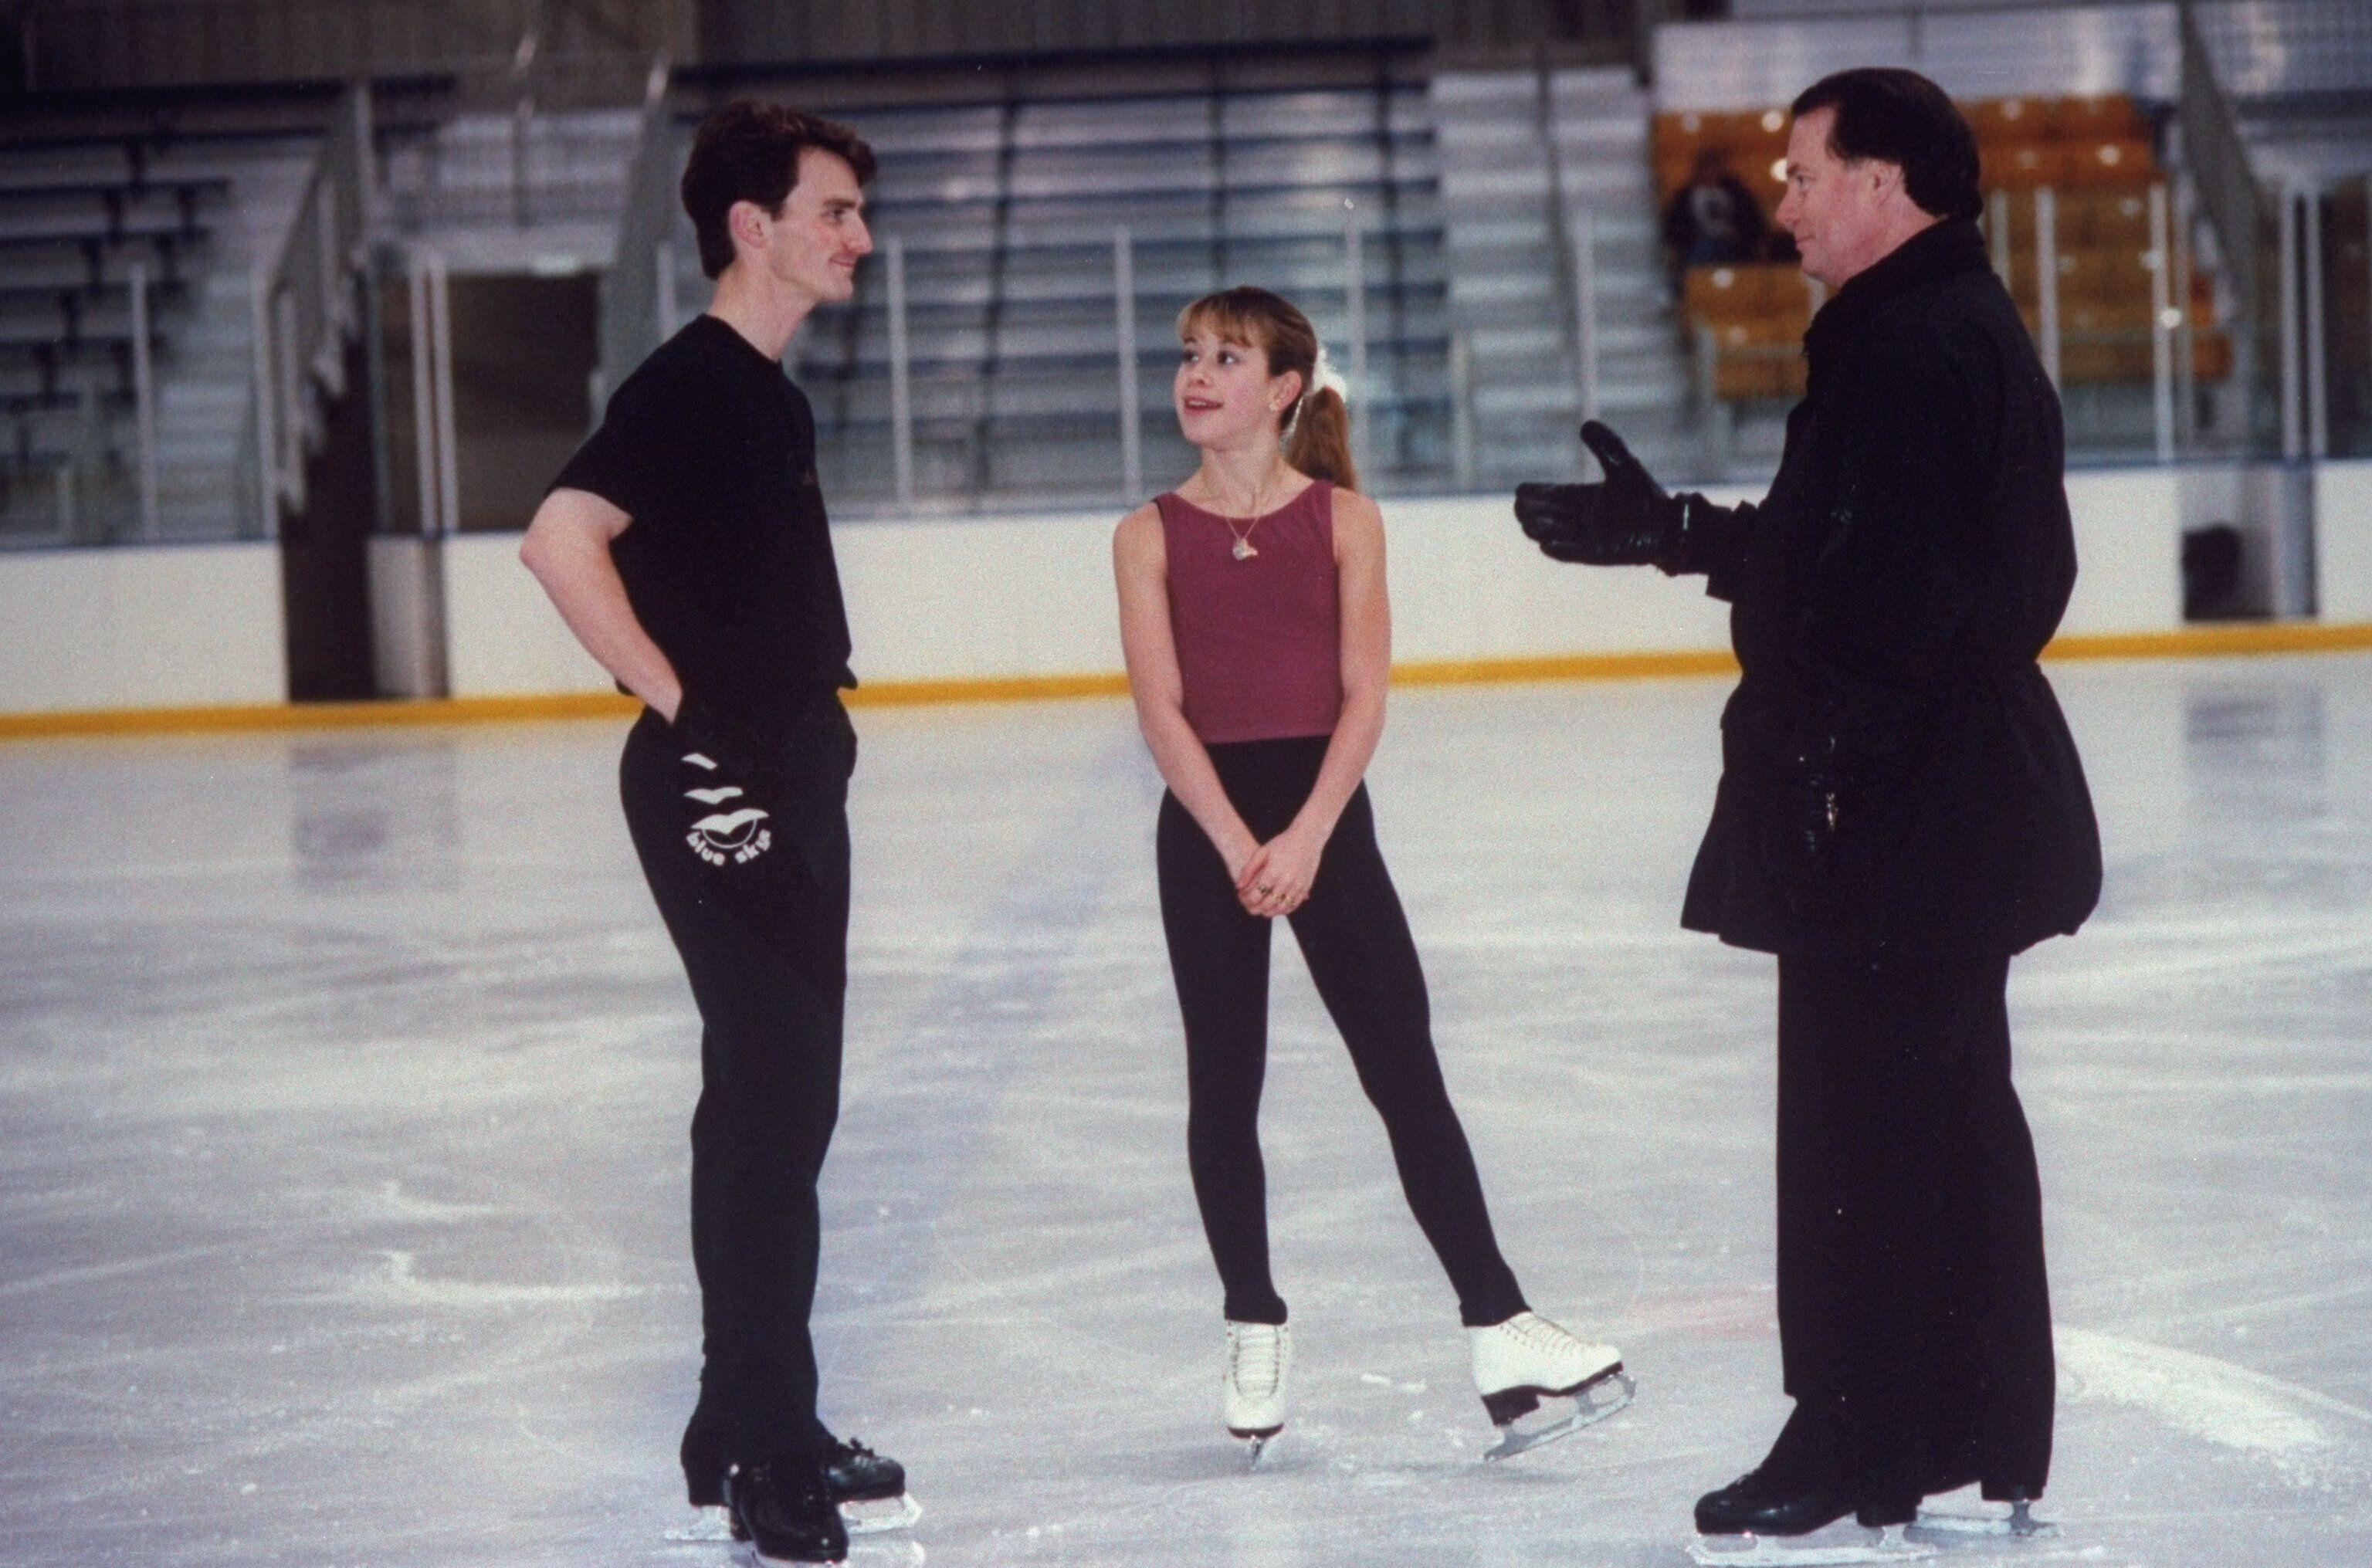 Richard Callaghan (right), coaching 1998 Olympic gold medalist Tara Lipinski (center) and 1996 world champion Todd Eldredge (